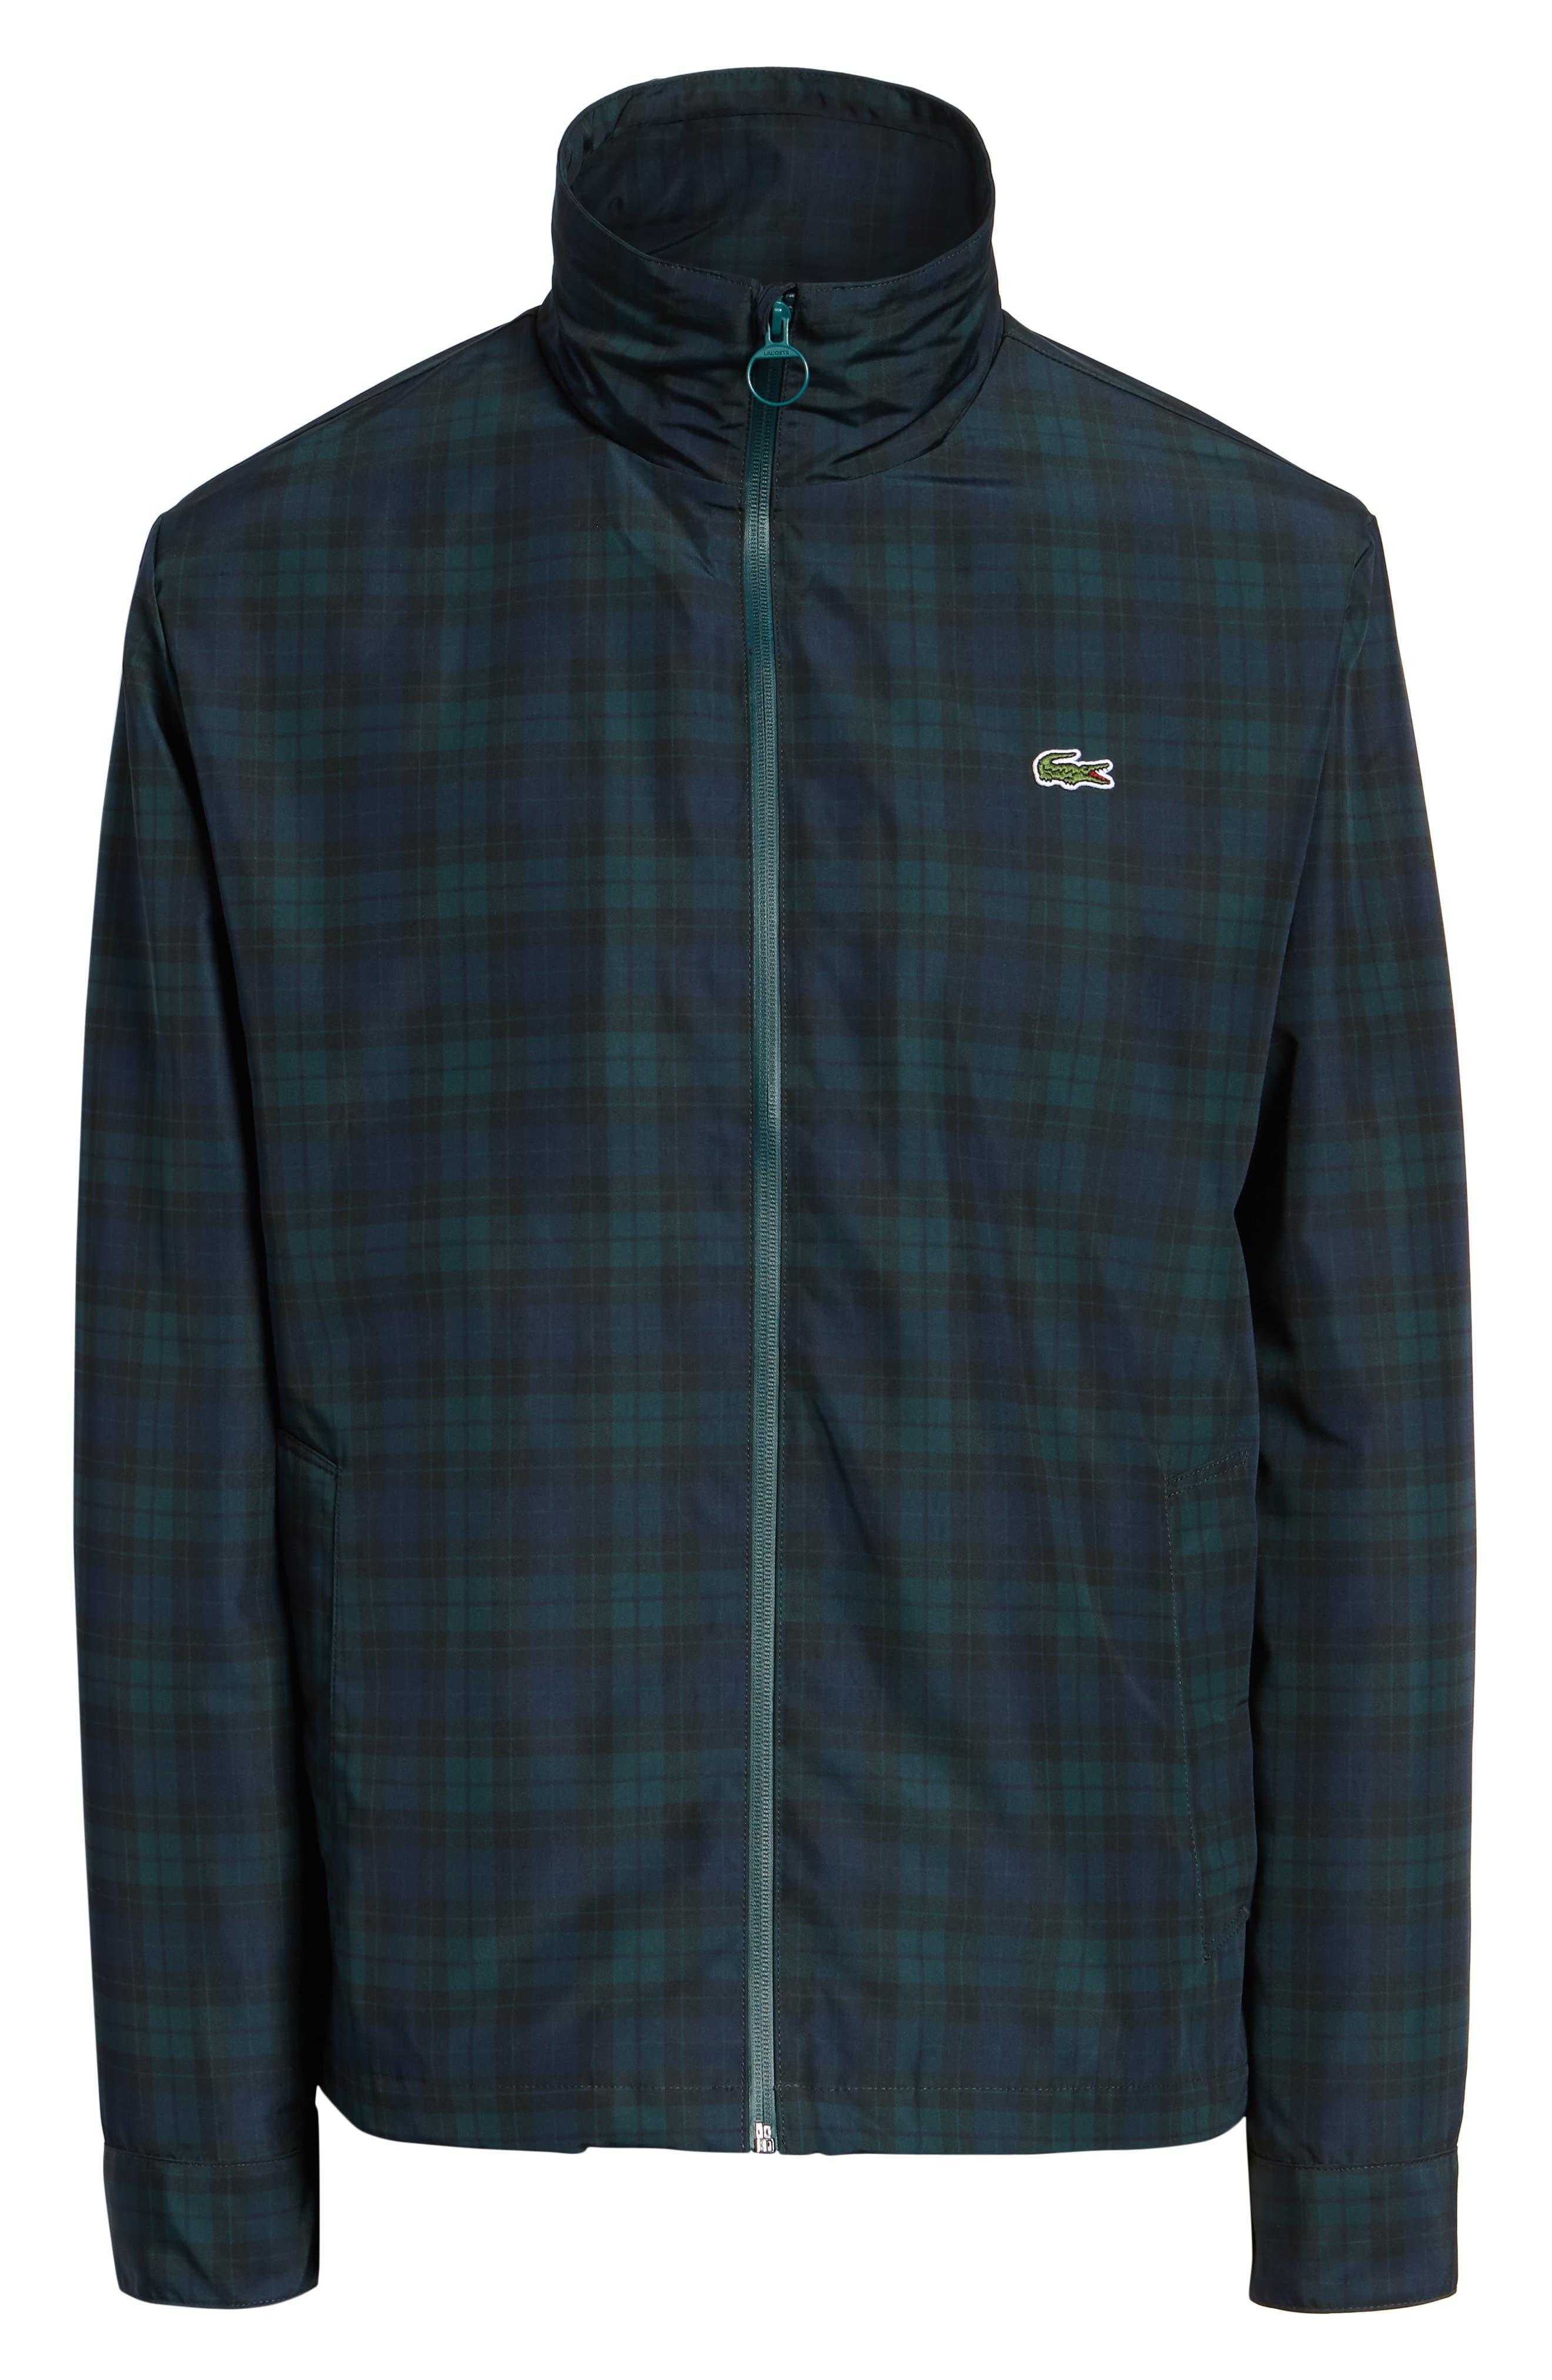 Regular Fit Check Windbreaker Jacket,                             Alternate thumbnail 6, color,                             NAVY BLUE/ SINOPLE BLACK